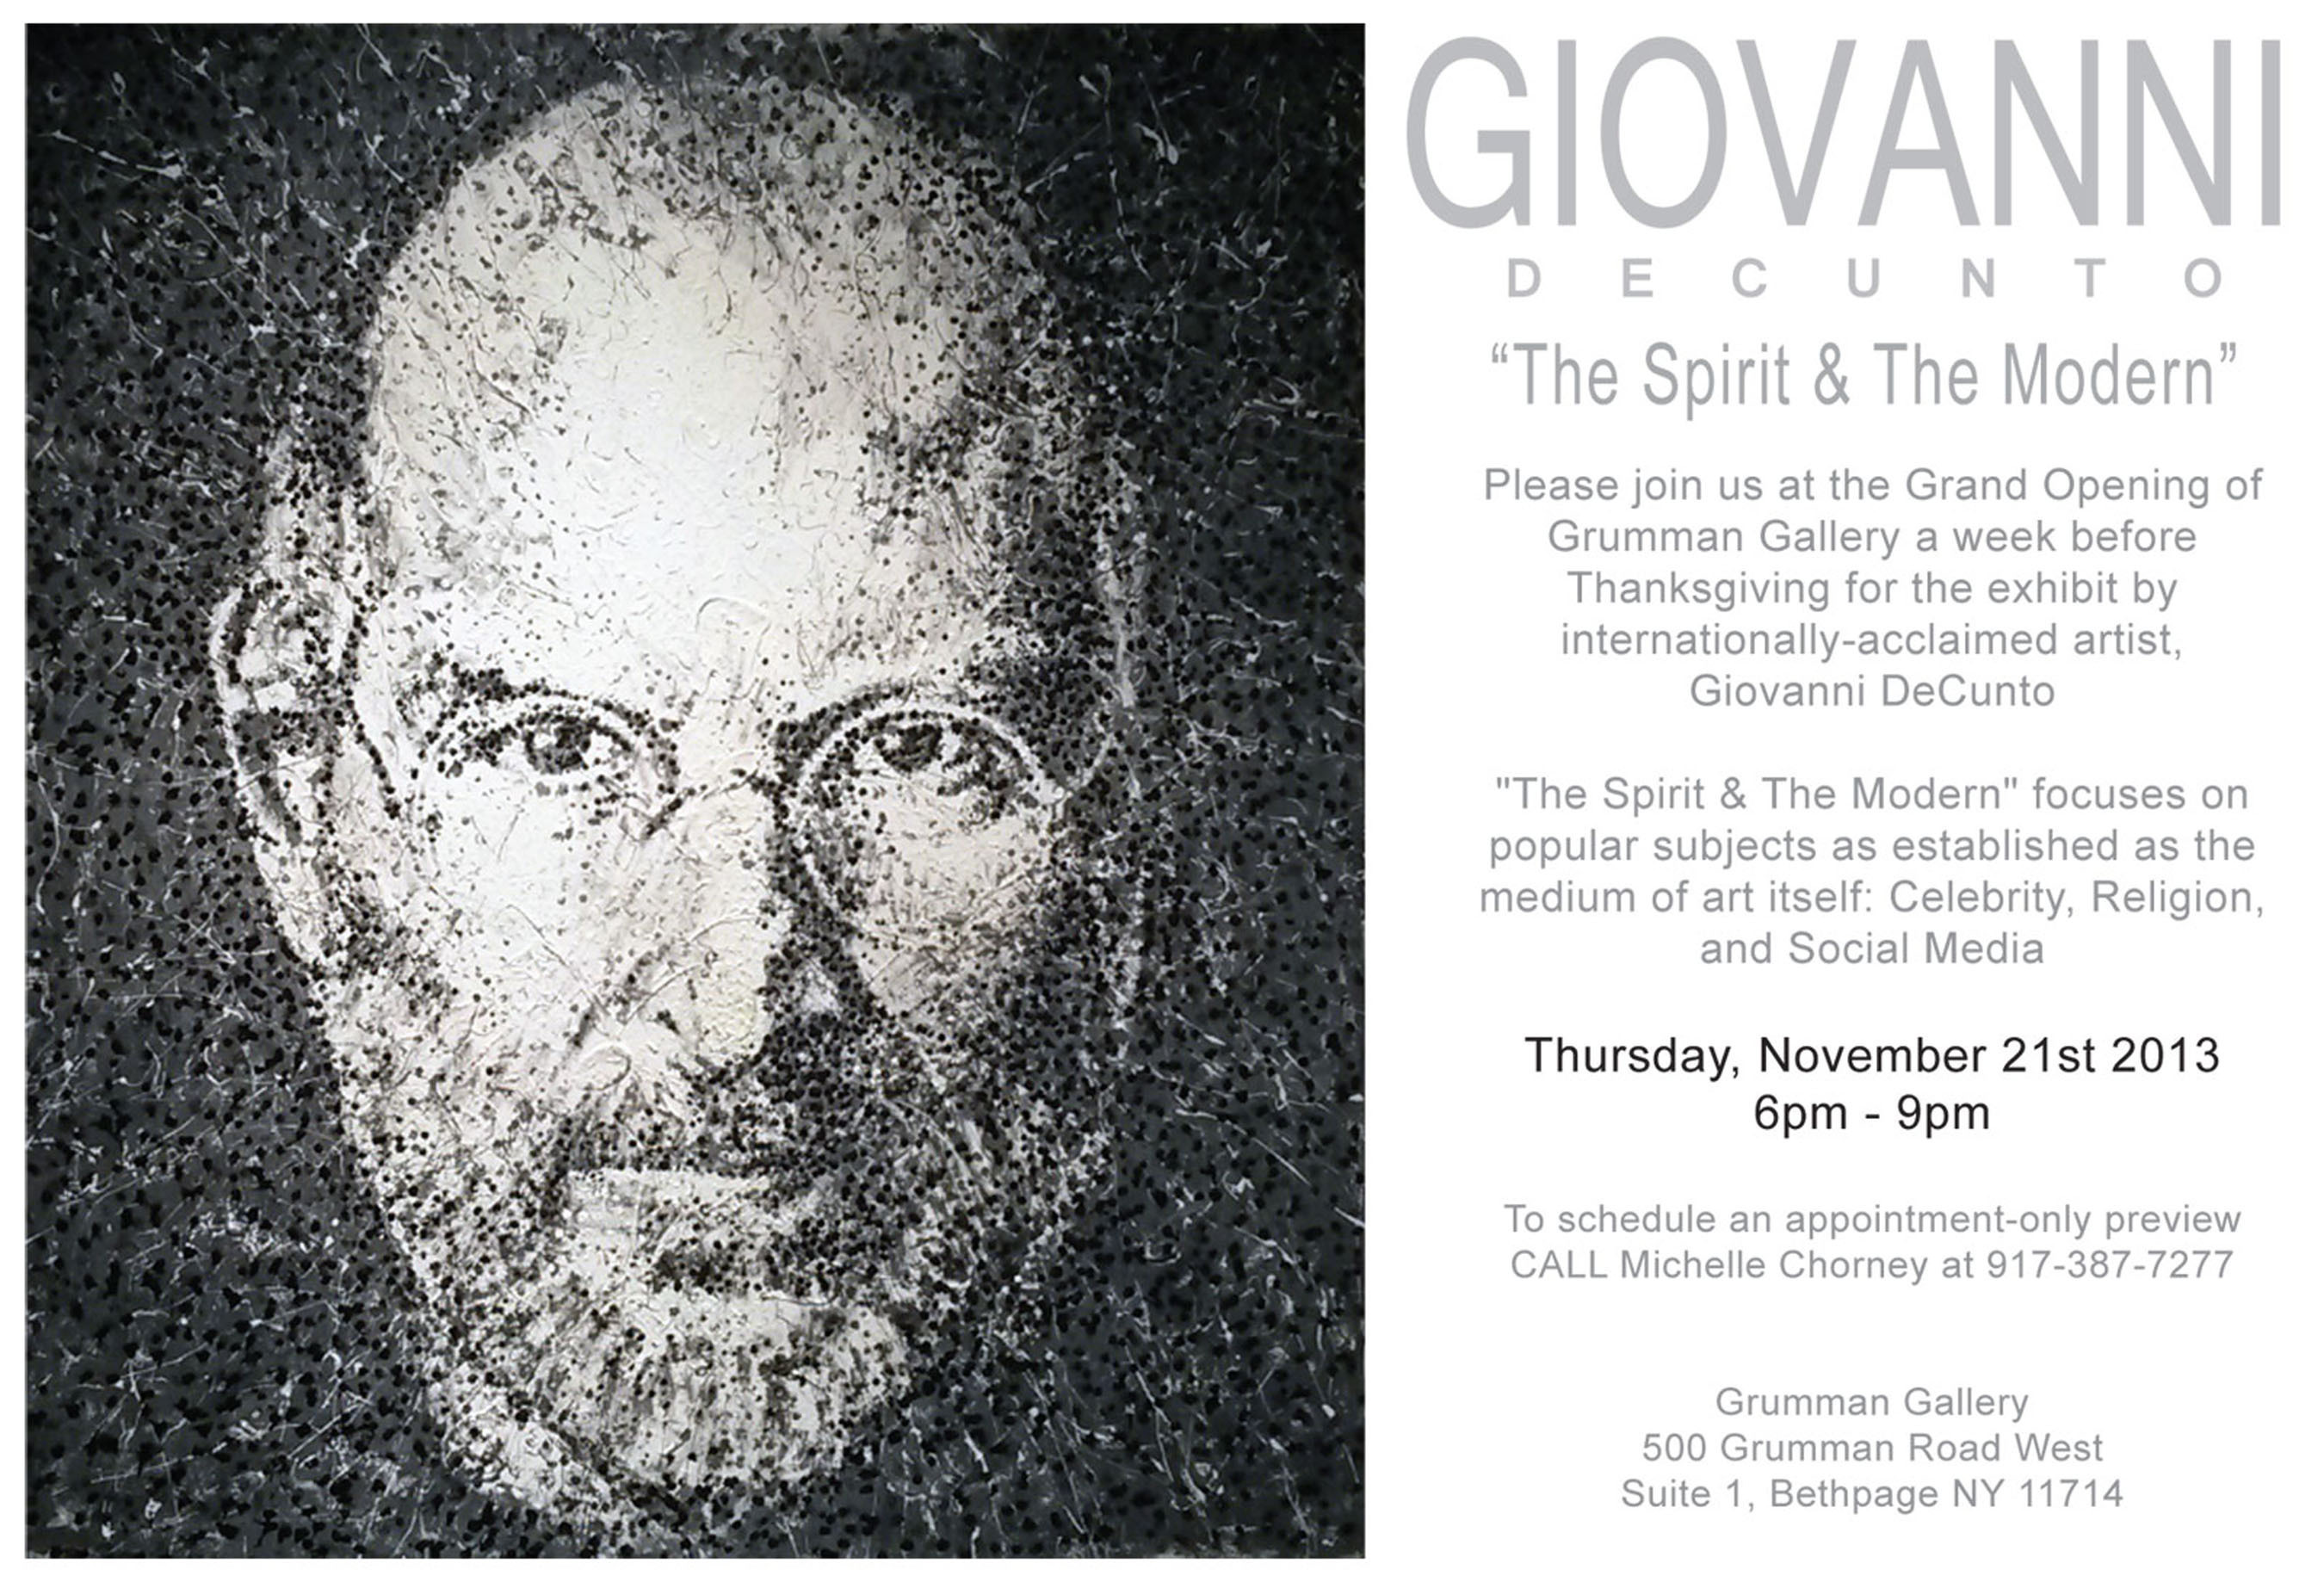 Grumman Gallery Grand Opening Invitation. (PRNewsFoto/Grumman Gallery) (PRNewsFoto/GRUMMAN GALLERY)